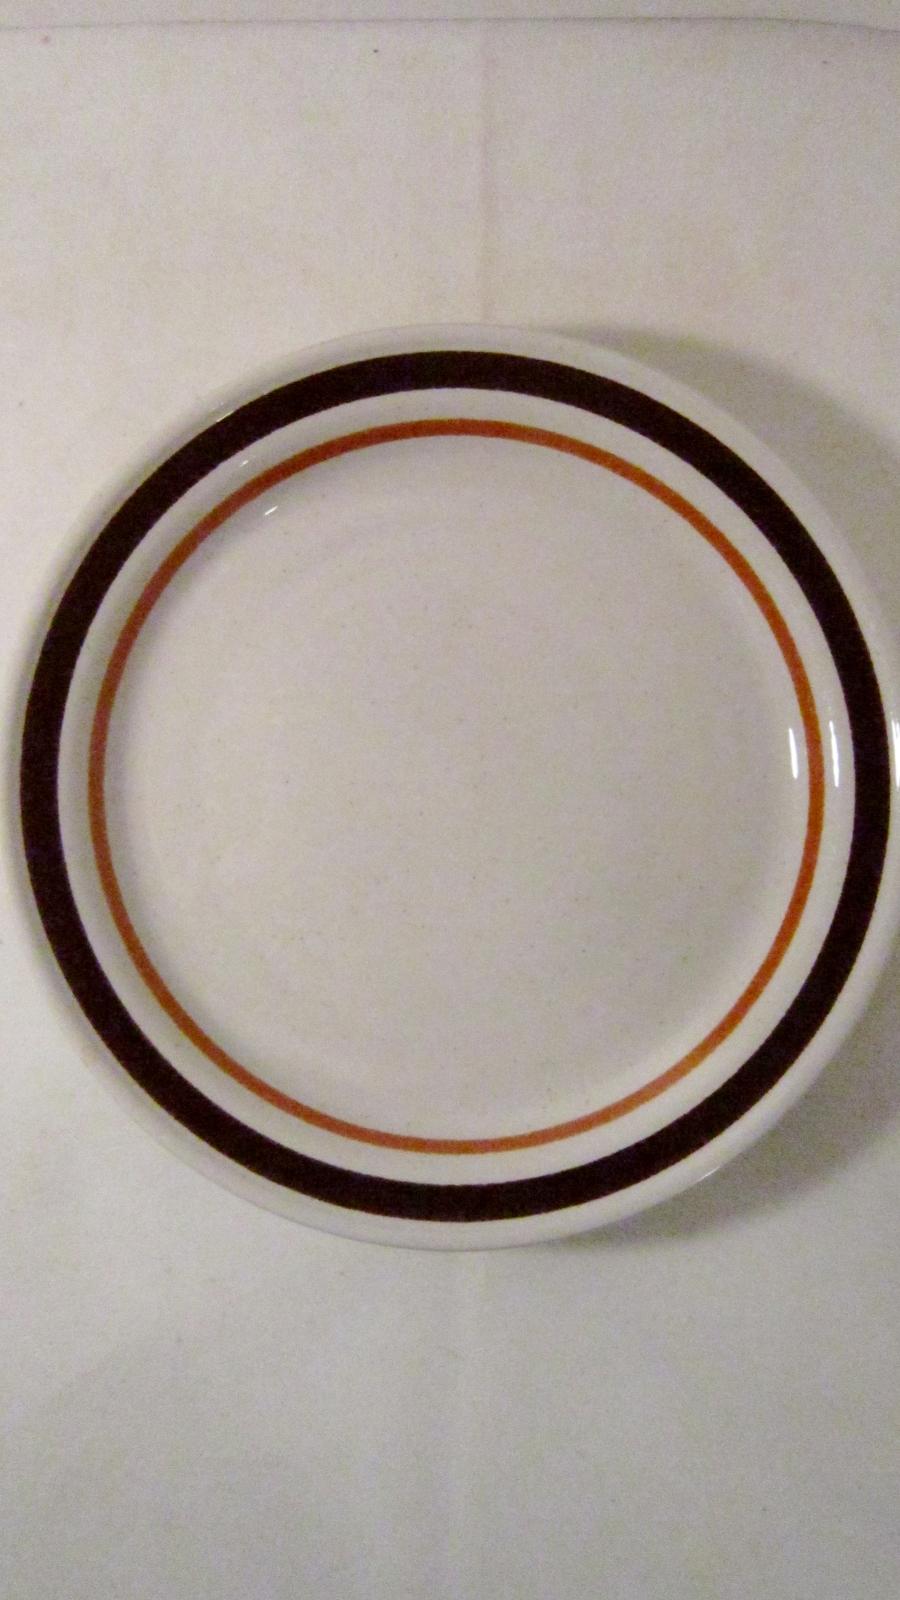 Encompass stoneware dessert salad plate 05